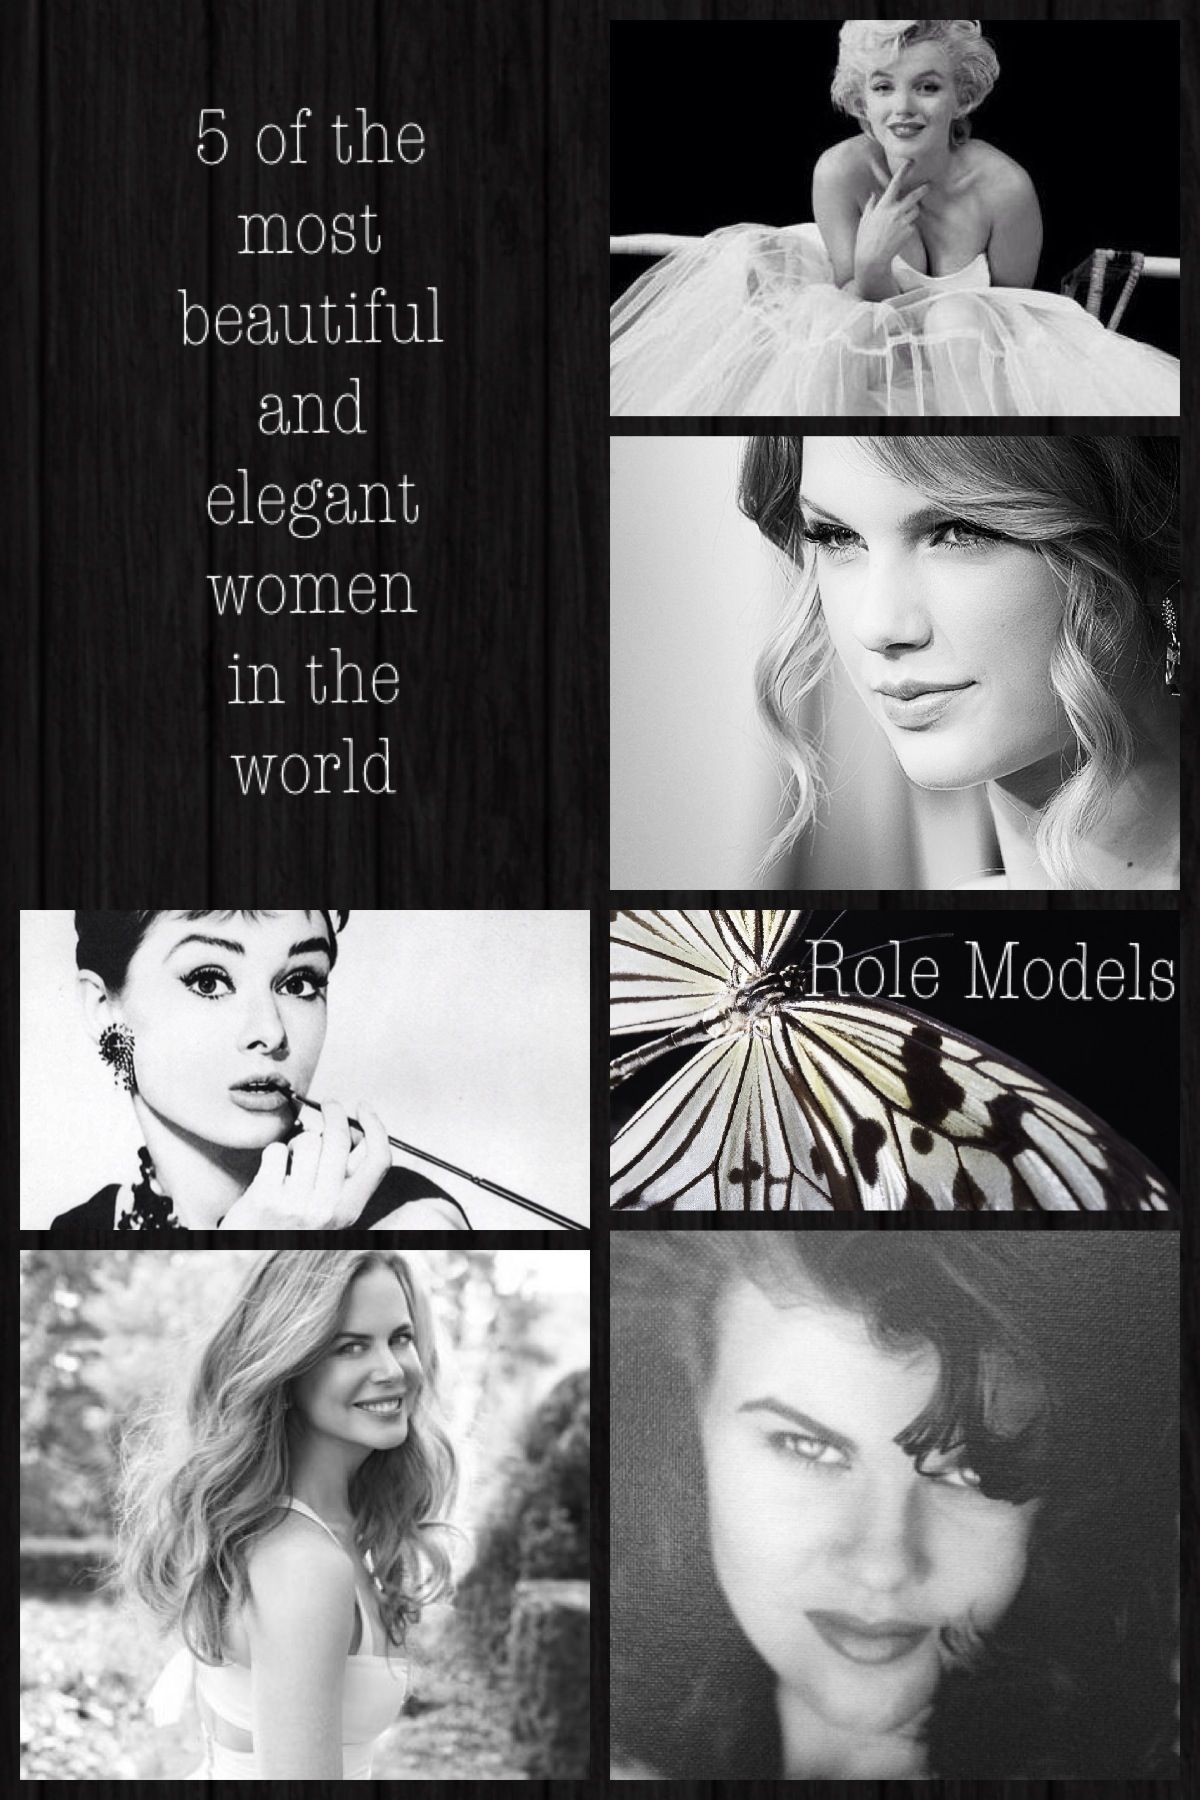 Role Models - Marilyn Monroe, Taylor Swift, Audrey Hepburn, Nicole Kidman and my mum <3